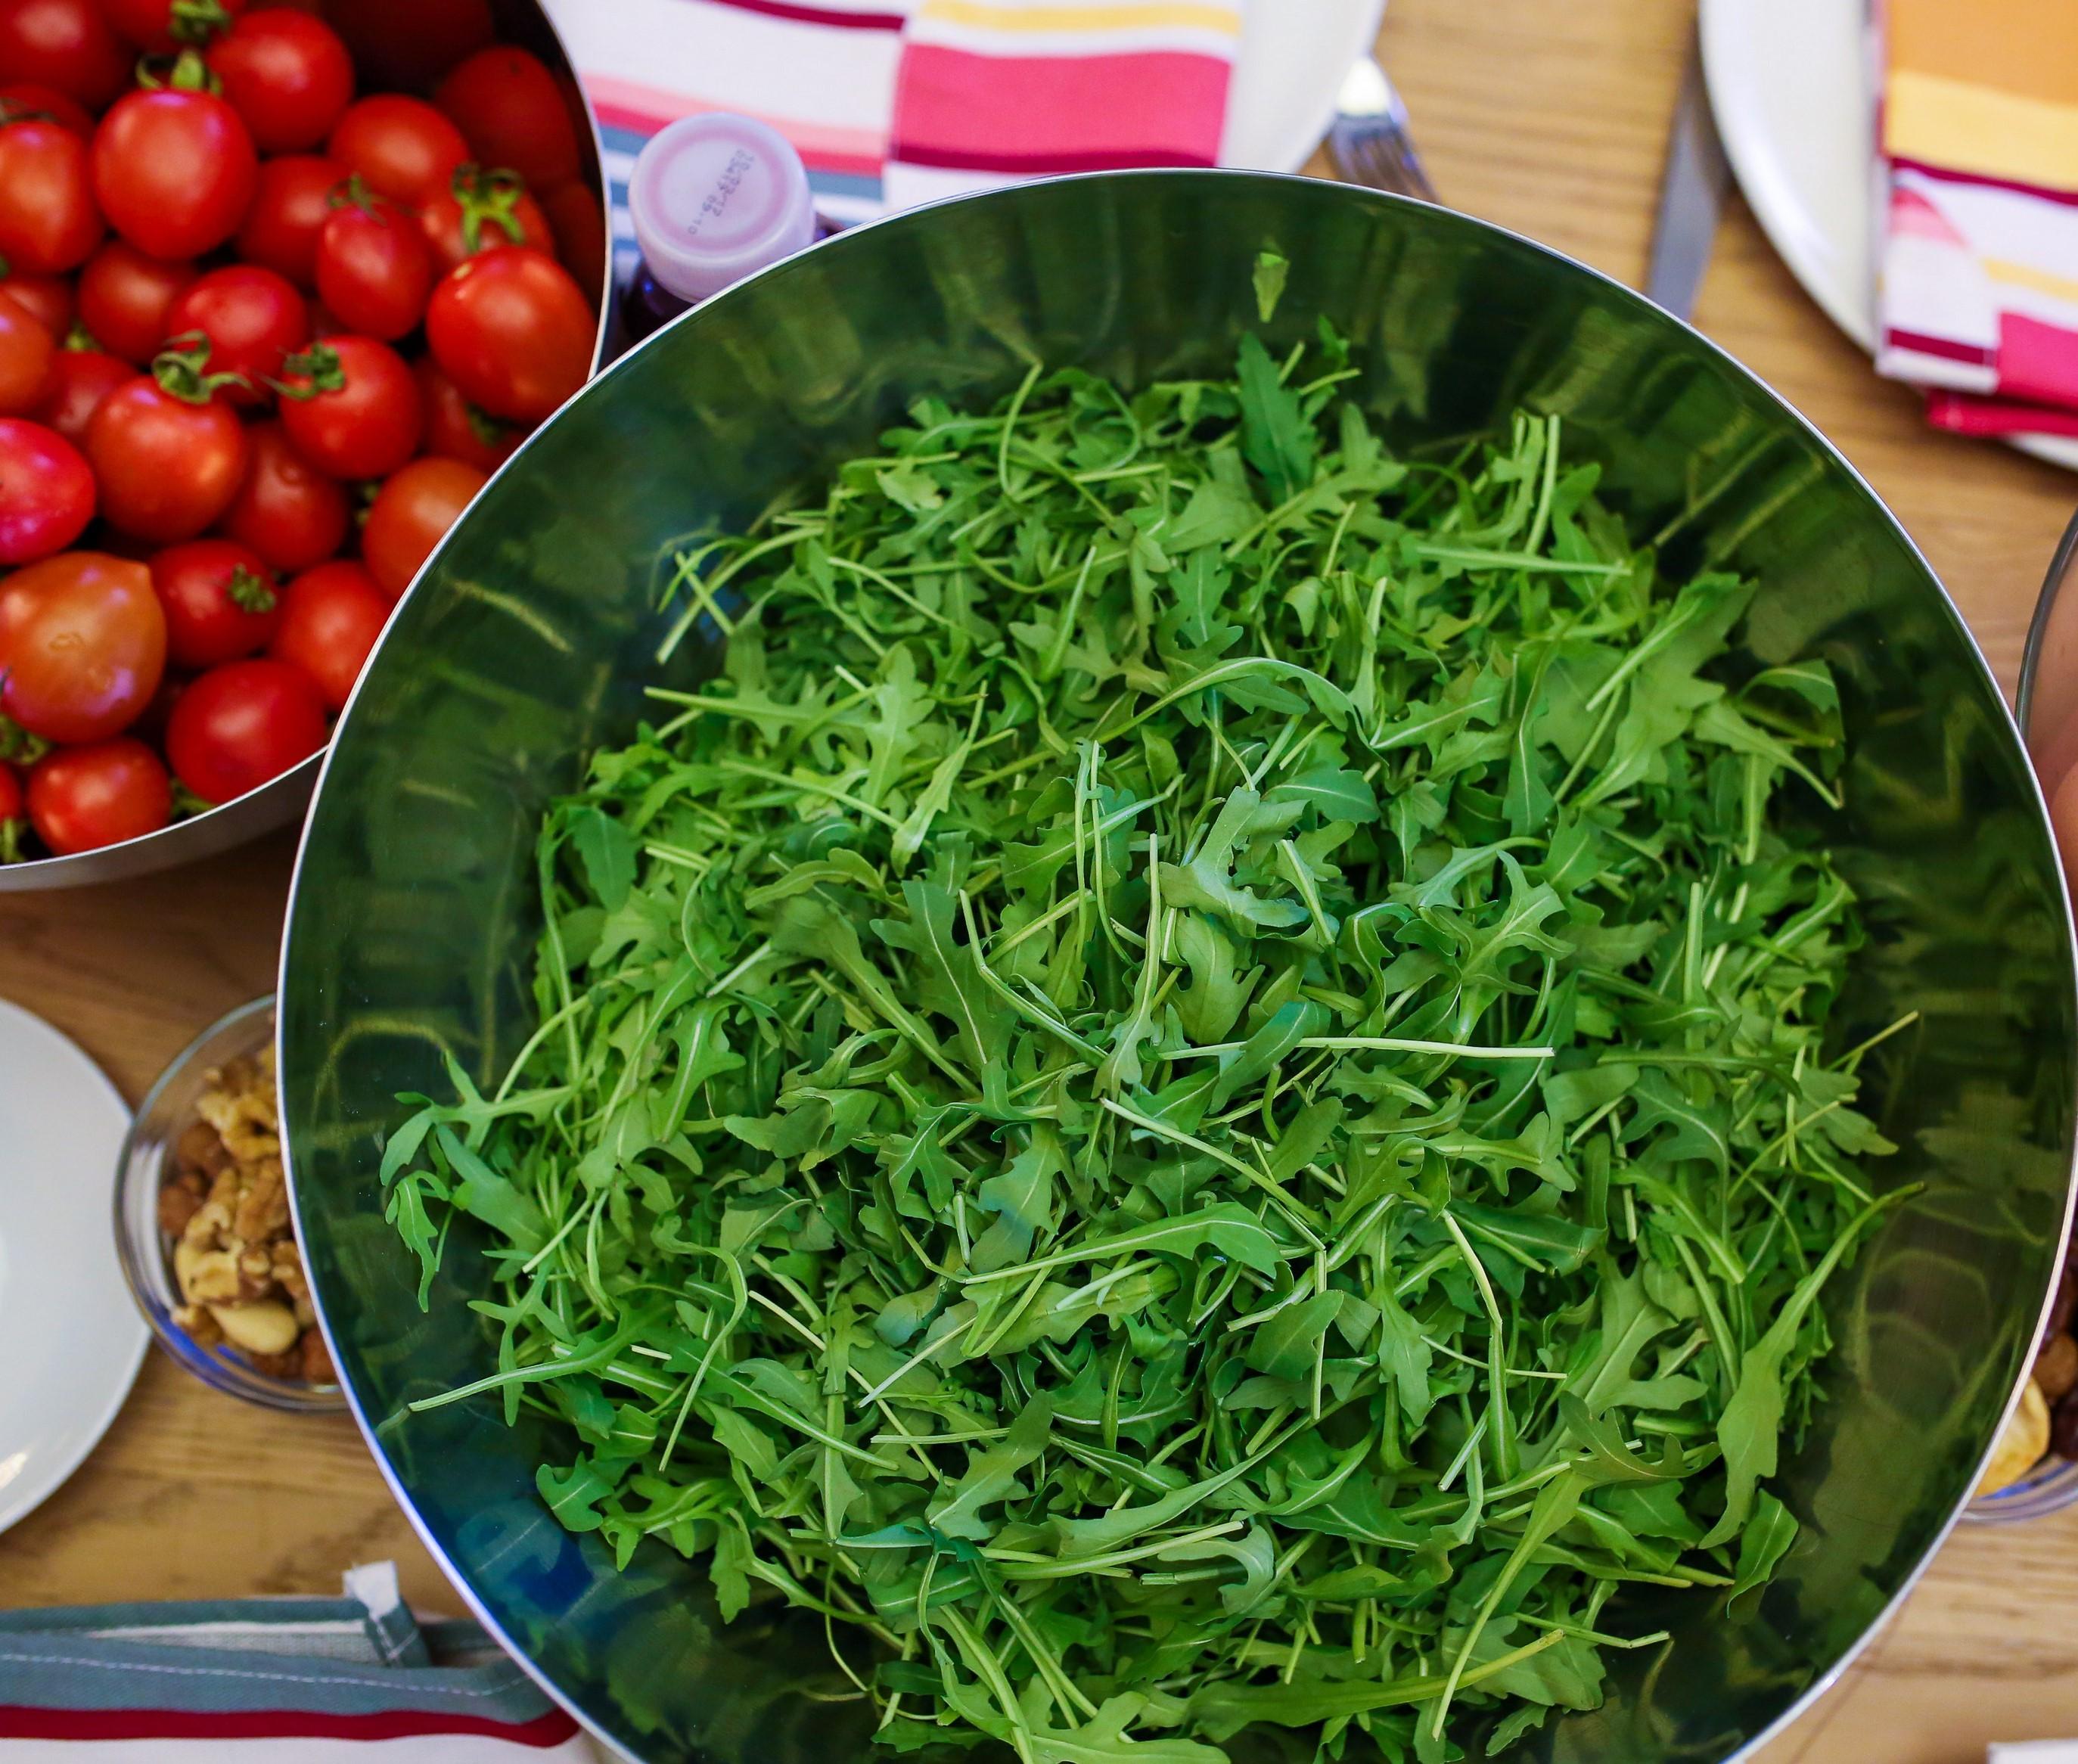 Atelier despre copii si legume la Raw Generation Expo